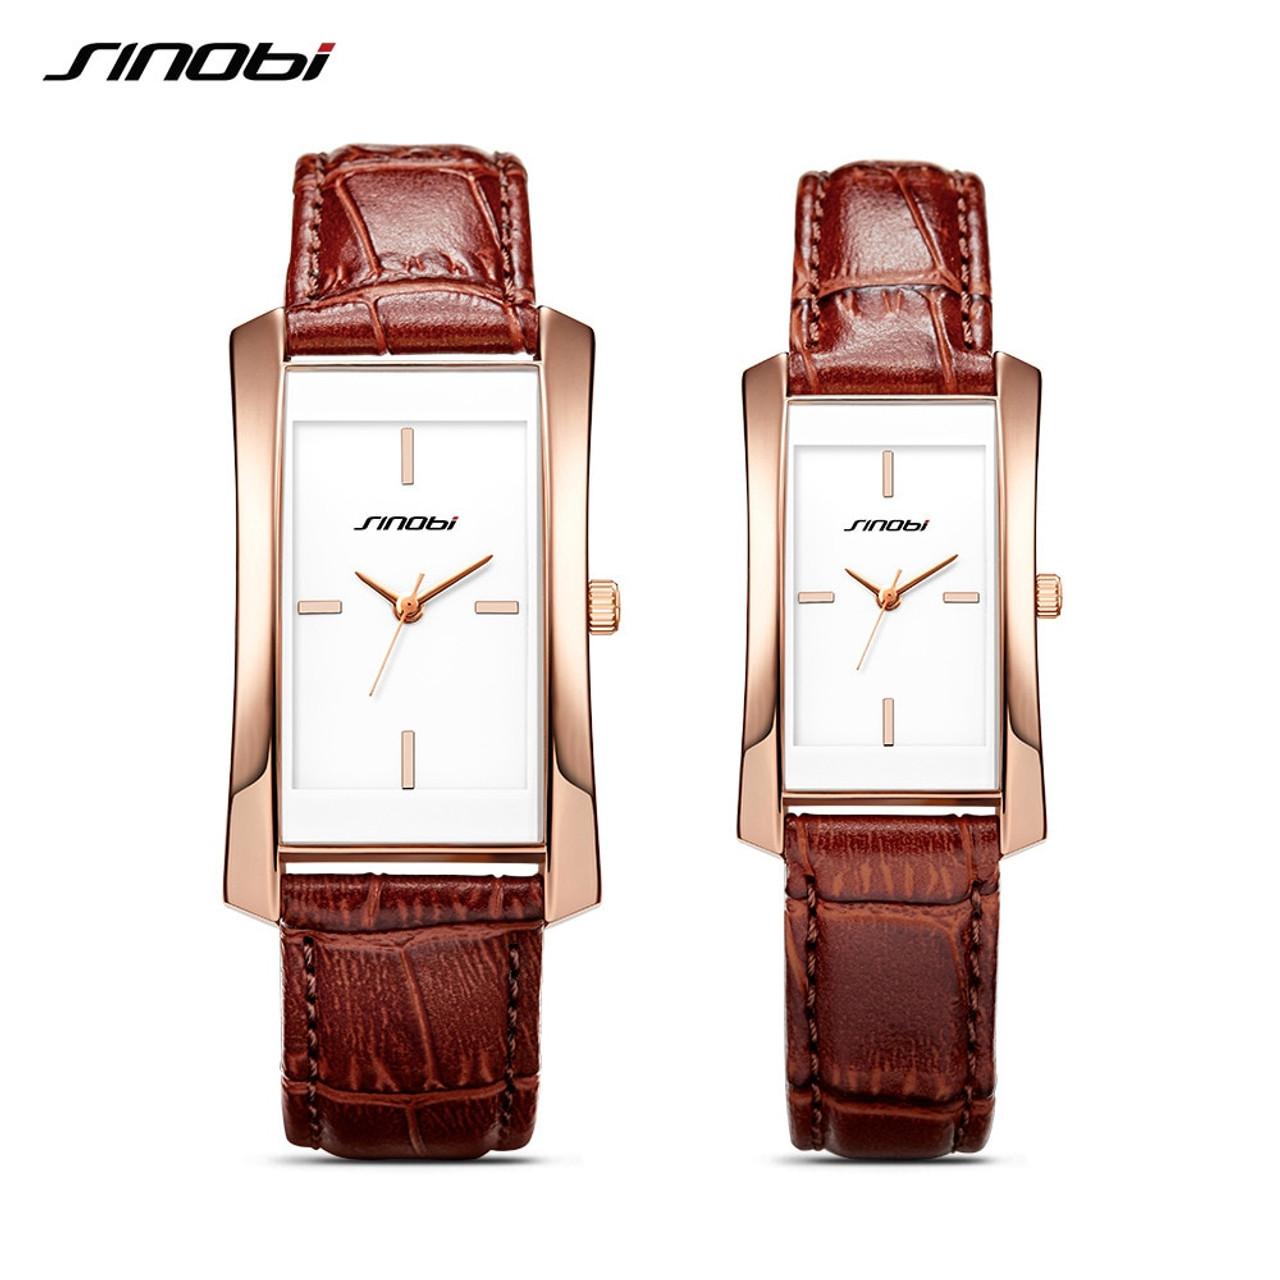 39b2d0bedec4 Sinobi Couple Watches Wedding Gift Noble Rose Gold Rectangle Wristwatch  Brown Strap Men Women Analog Quartz ...